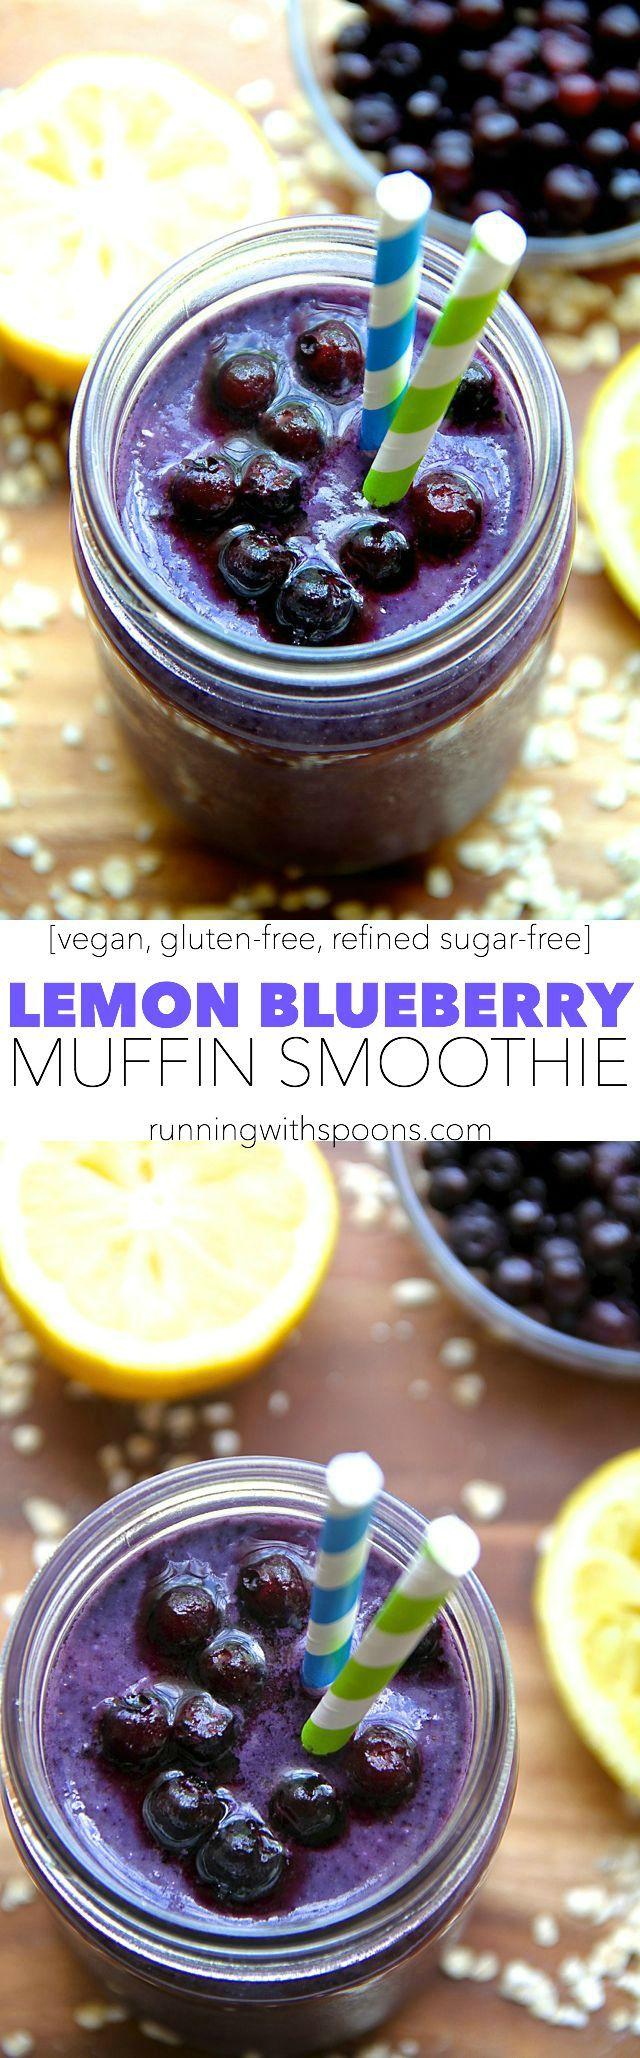 Best 25+ Blueberry juice ideas on Pinterest | Blueberry ...